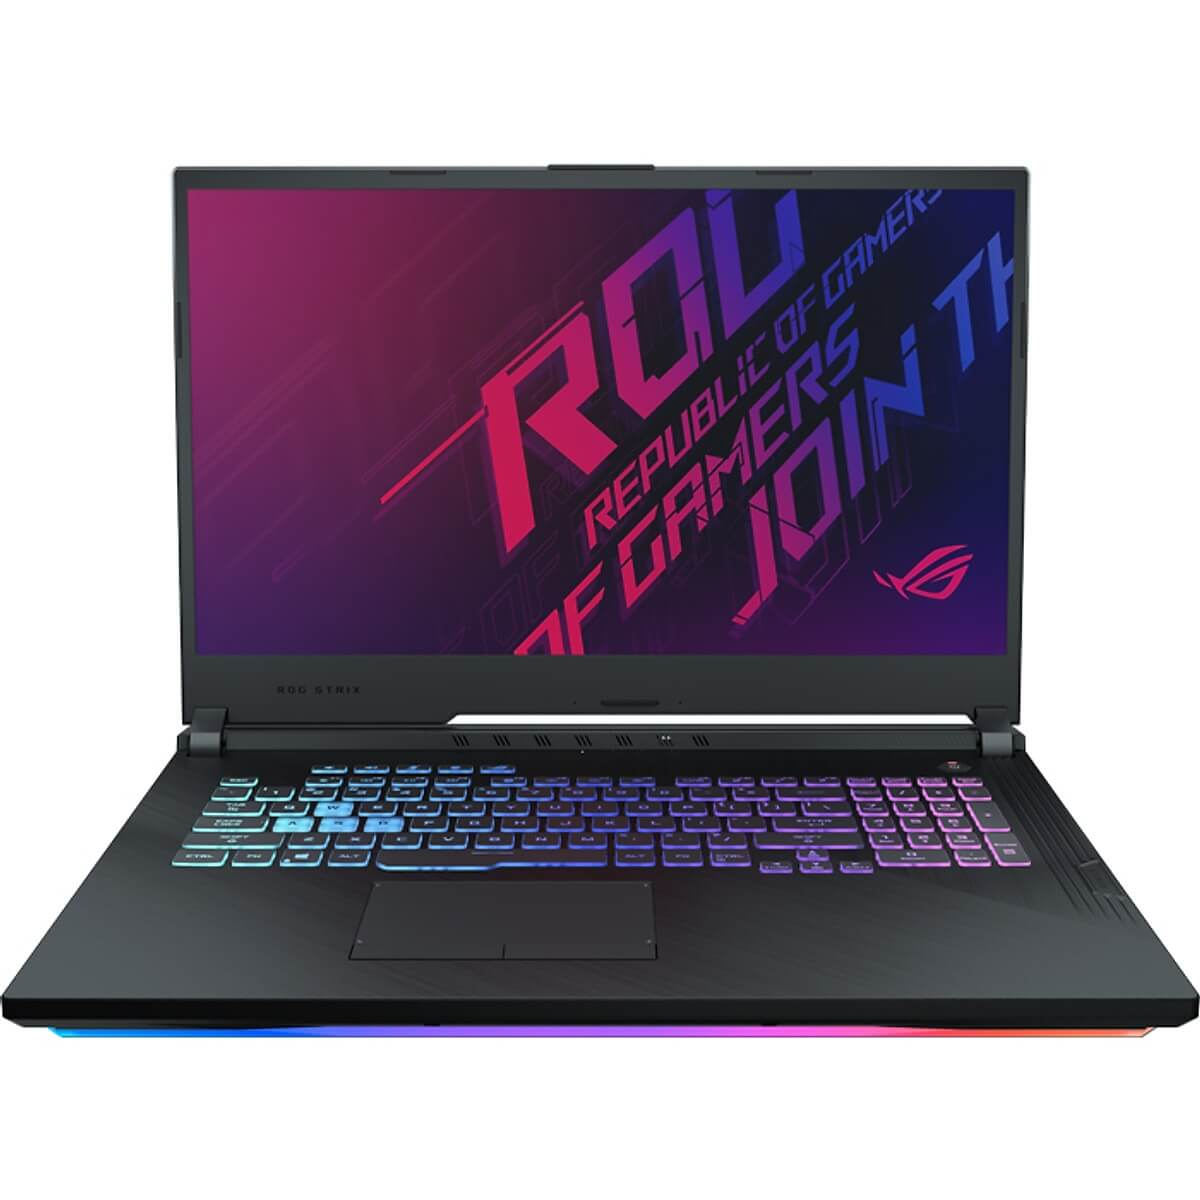 Laptop ASUS ROG Strix G G731-UEV140T Core i7-9750H, RAM 8GB, SSD 512GB, 17.3 Inch Full HD IPS